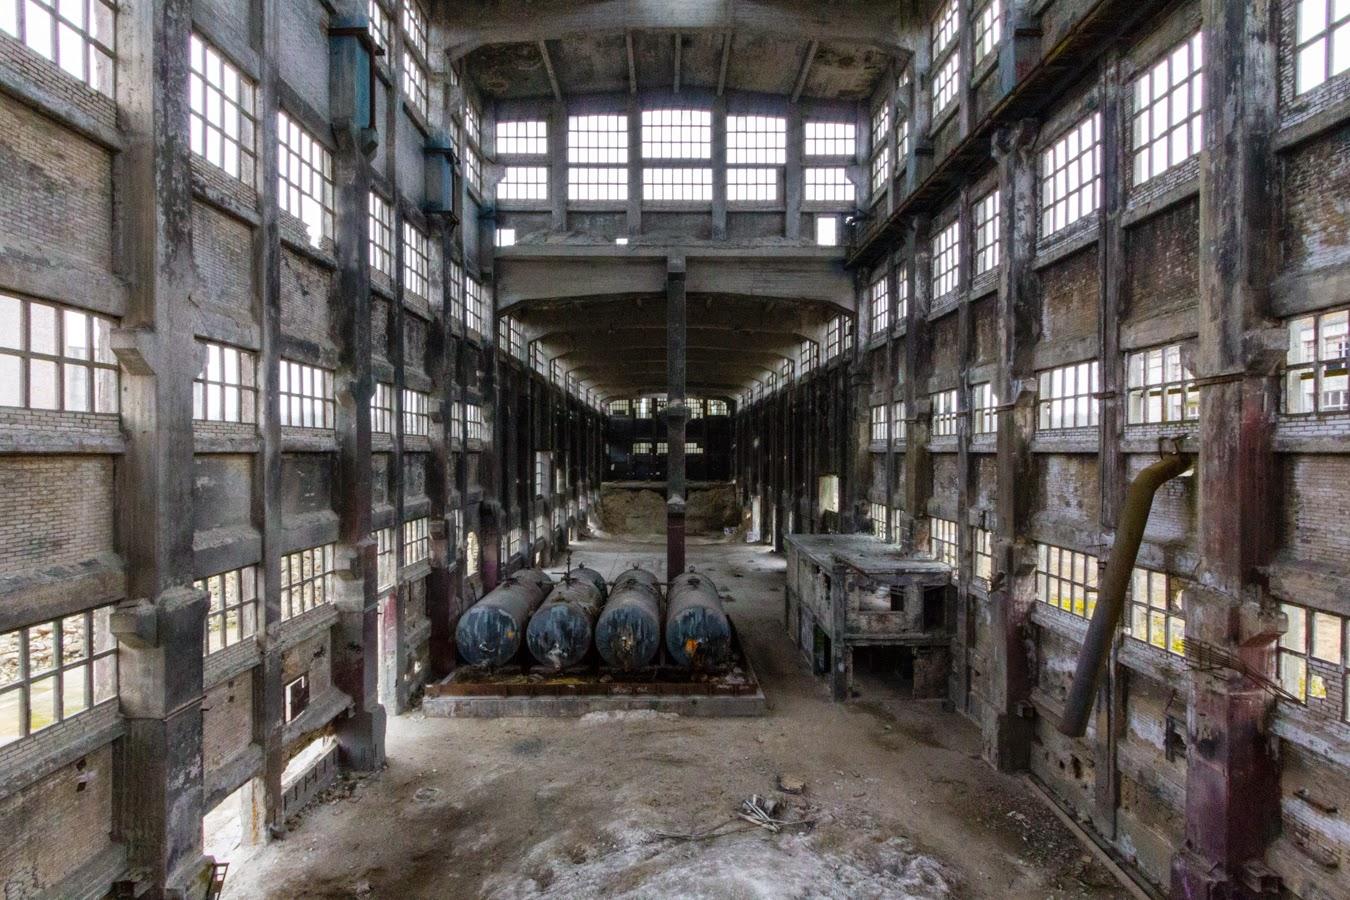 colossus chemiewerk r dersdorf abandoned berlin. Black Bedroom Furniture Sets. Home Design Ideas